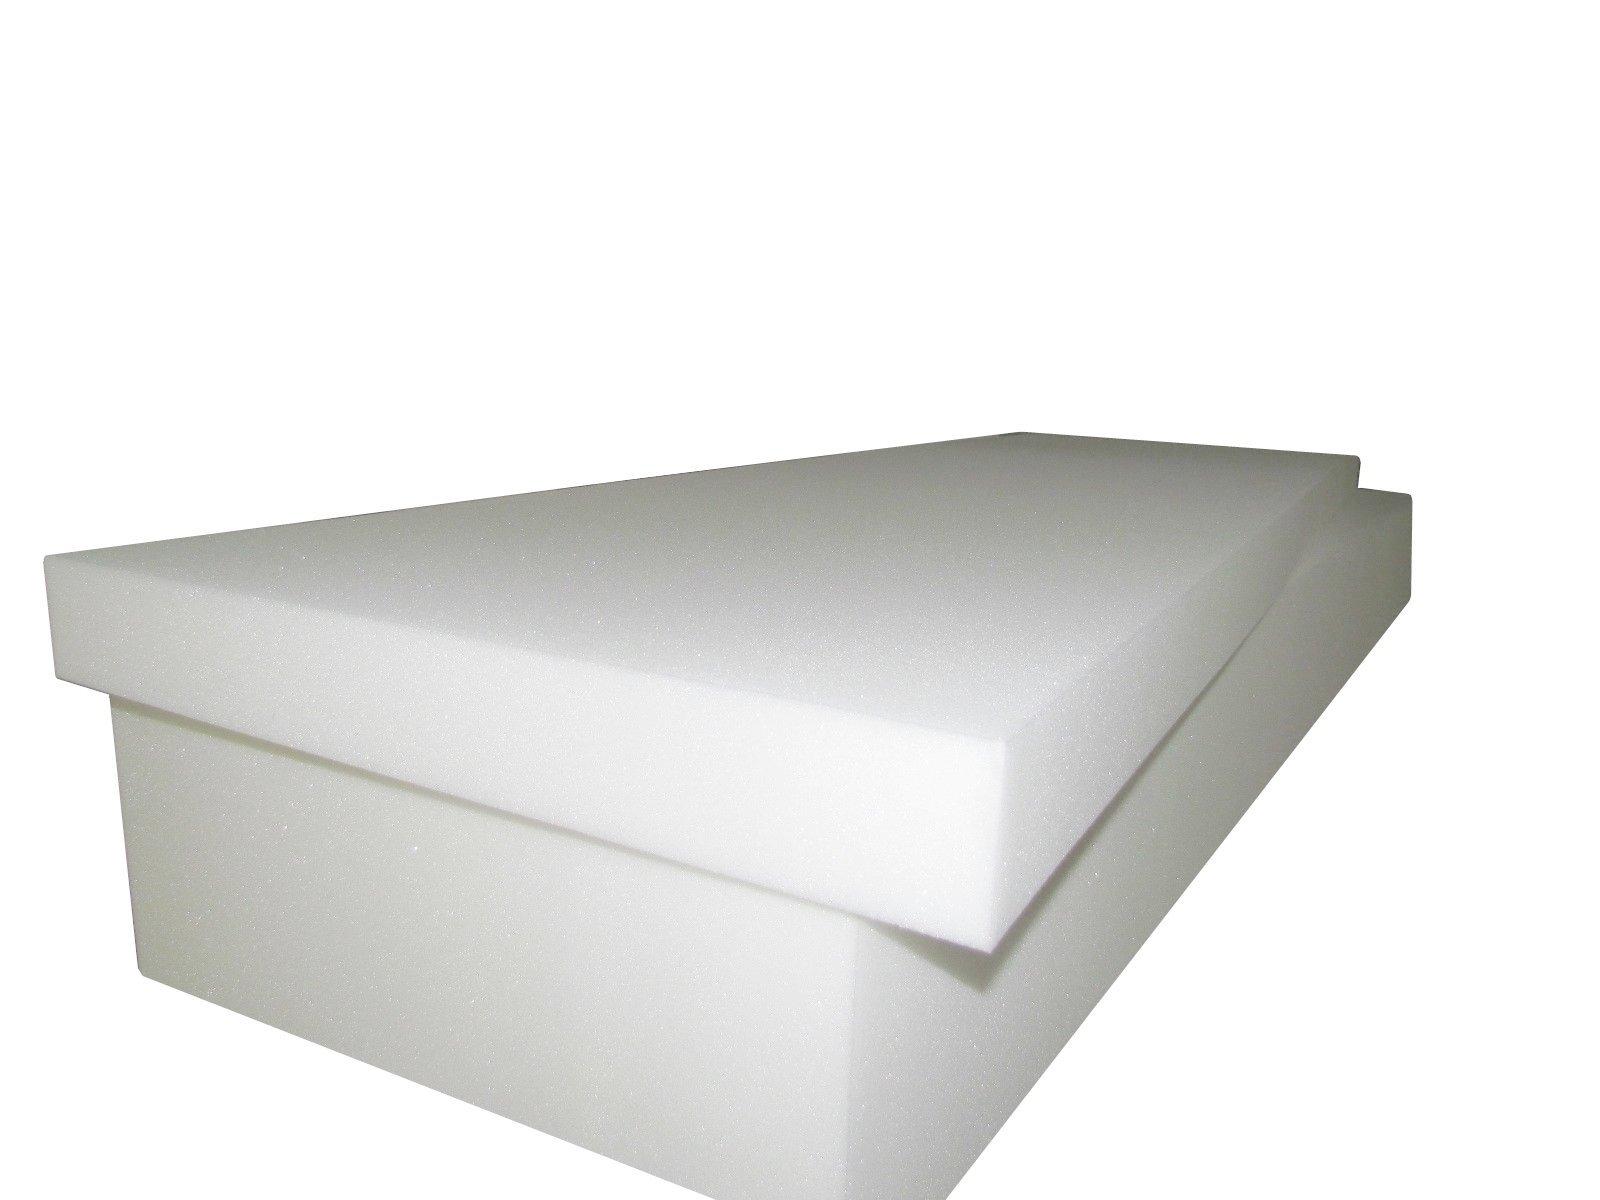 Foam Cushion 4''T x 27''W x 80''L (1536) ''Medium Firm'' Sofa Seat Replacement Foam Cushion, Upholstery Foam Slab, Foam Padding by Isellfoam